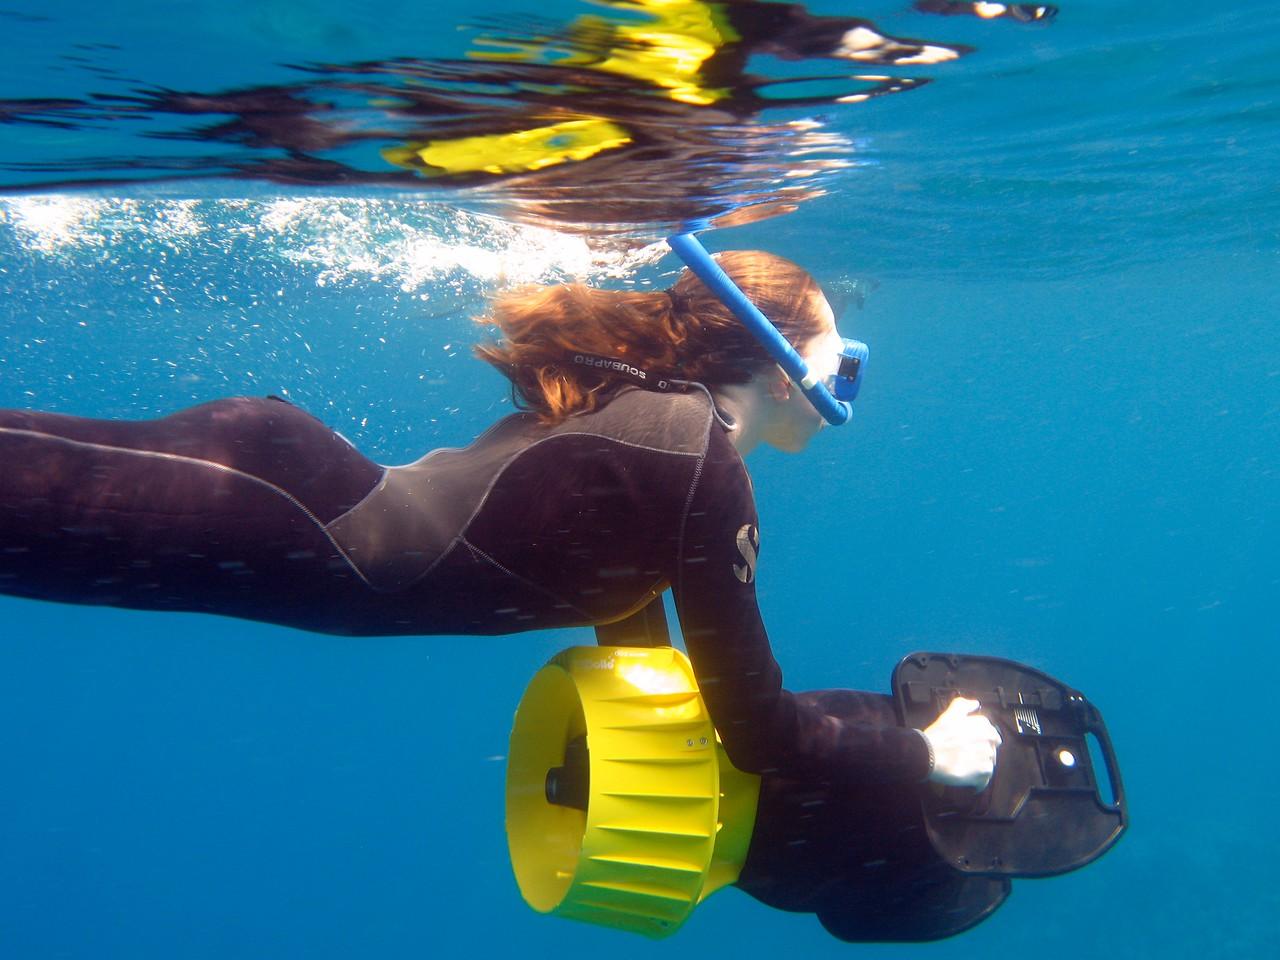 James Bond-style underwater jet pack